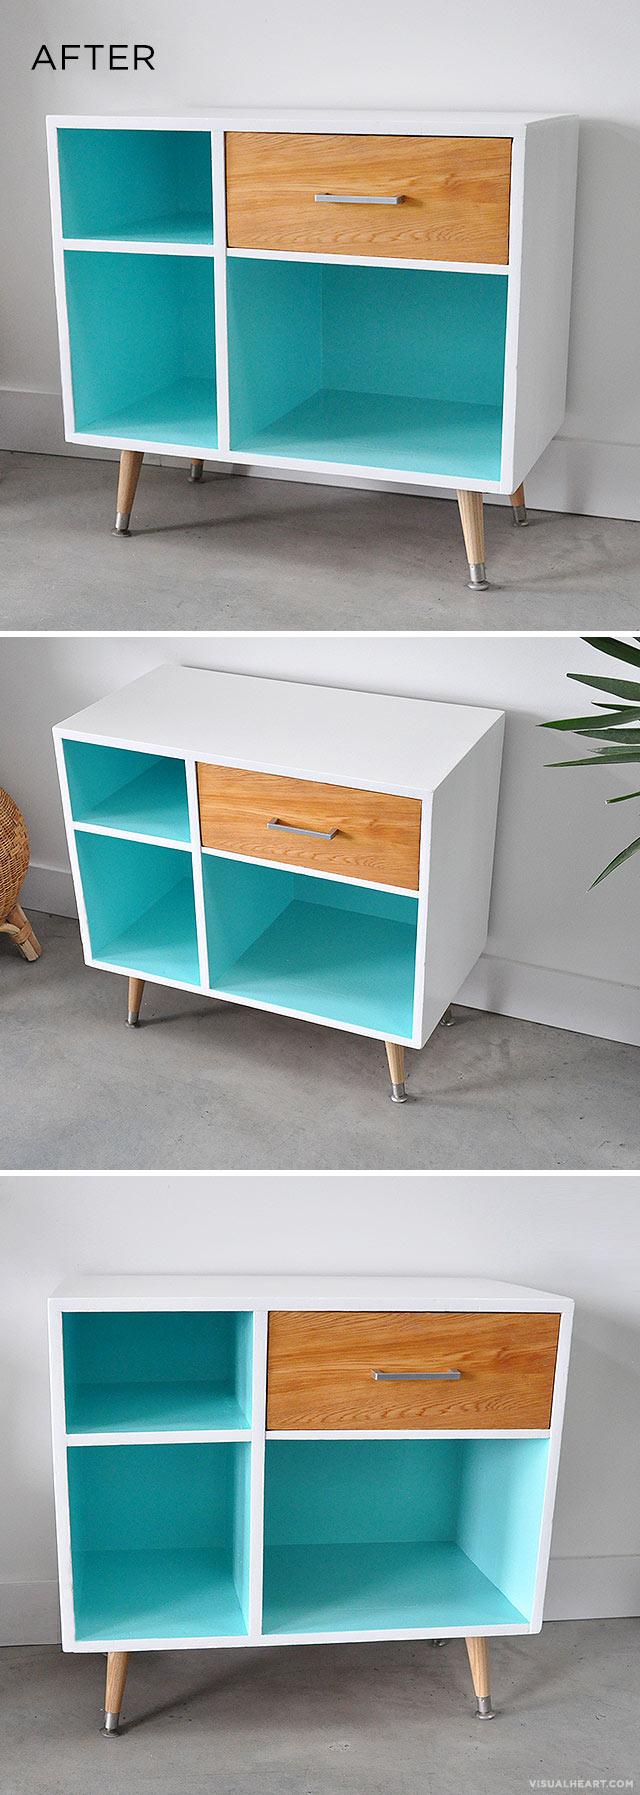 Mid Century Modern Style Cabinet